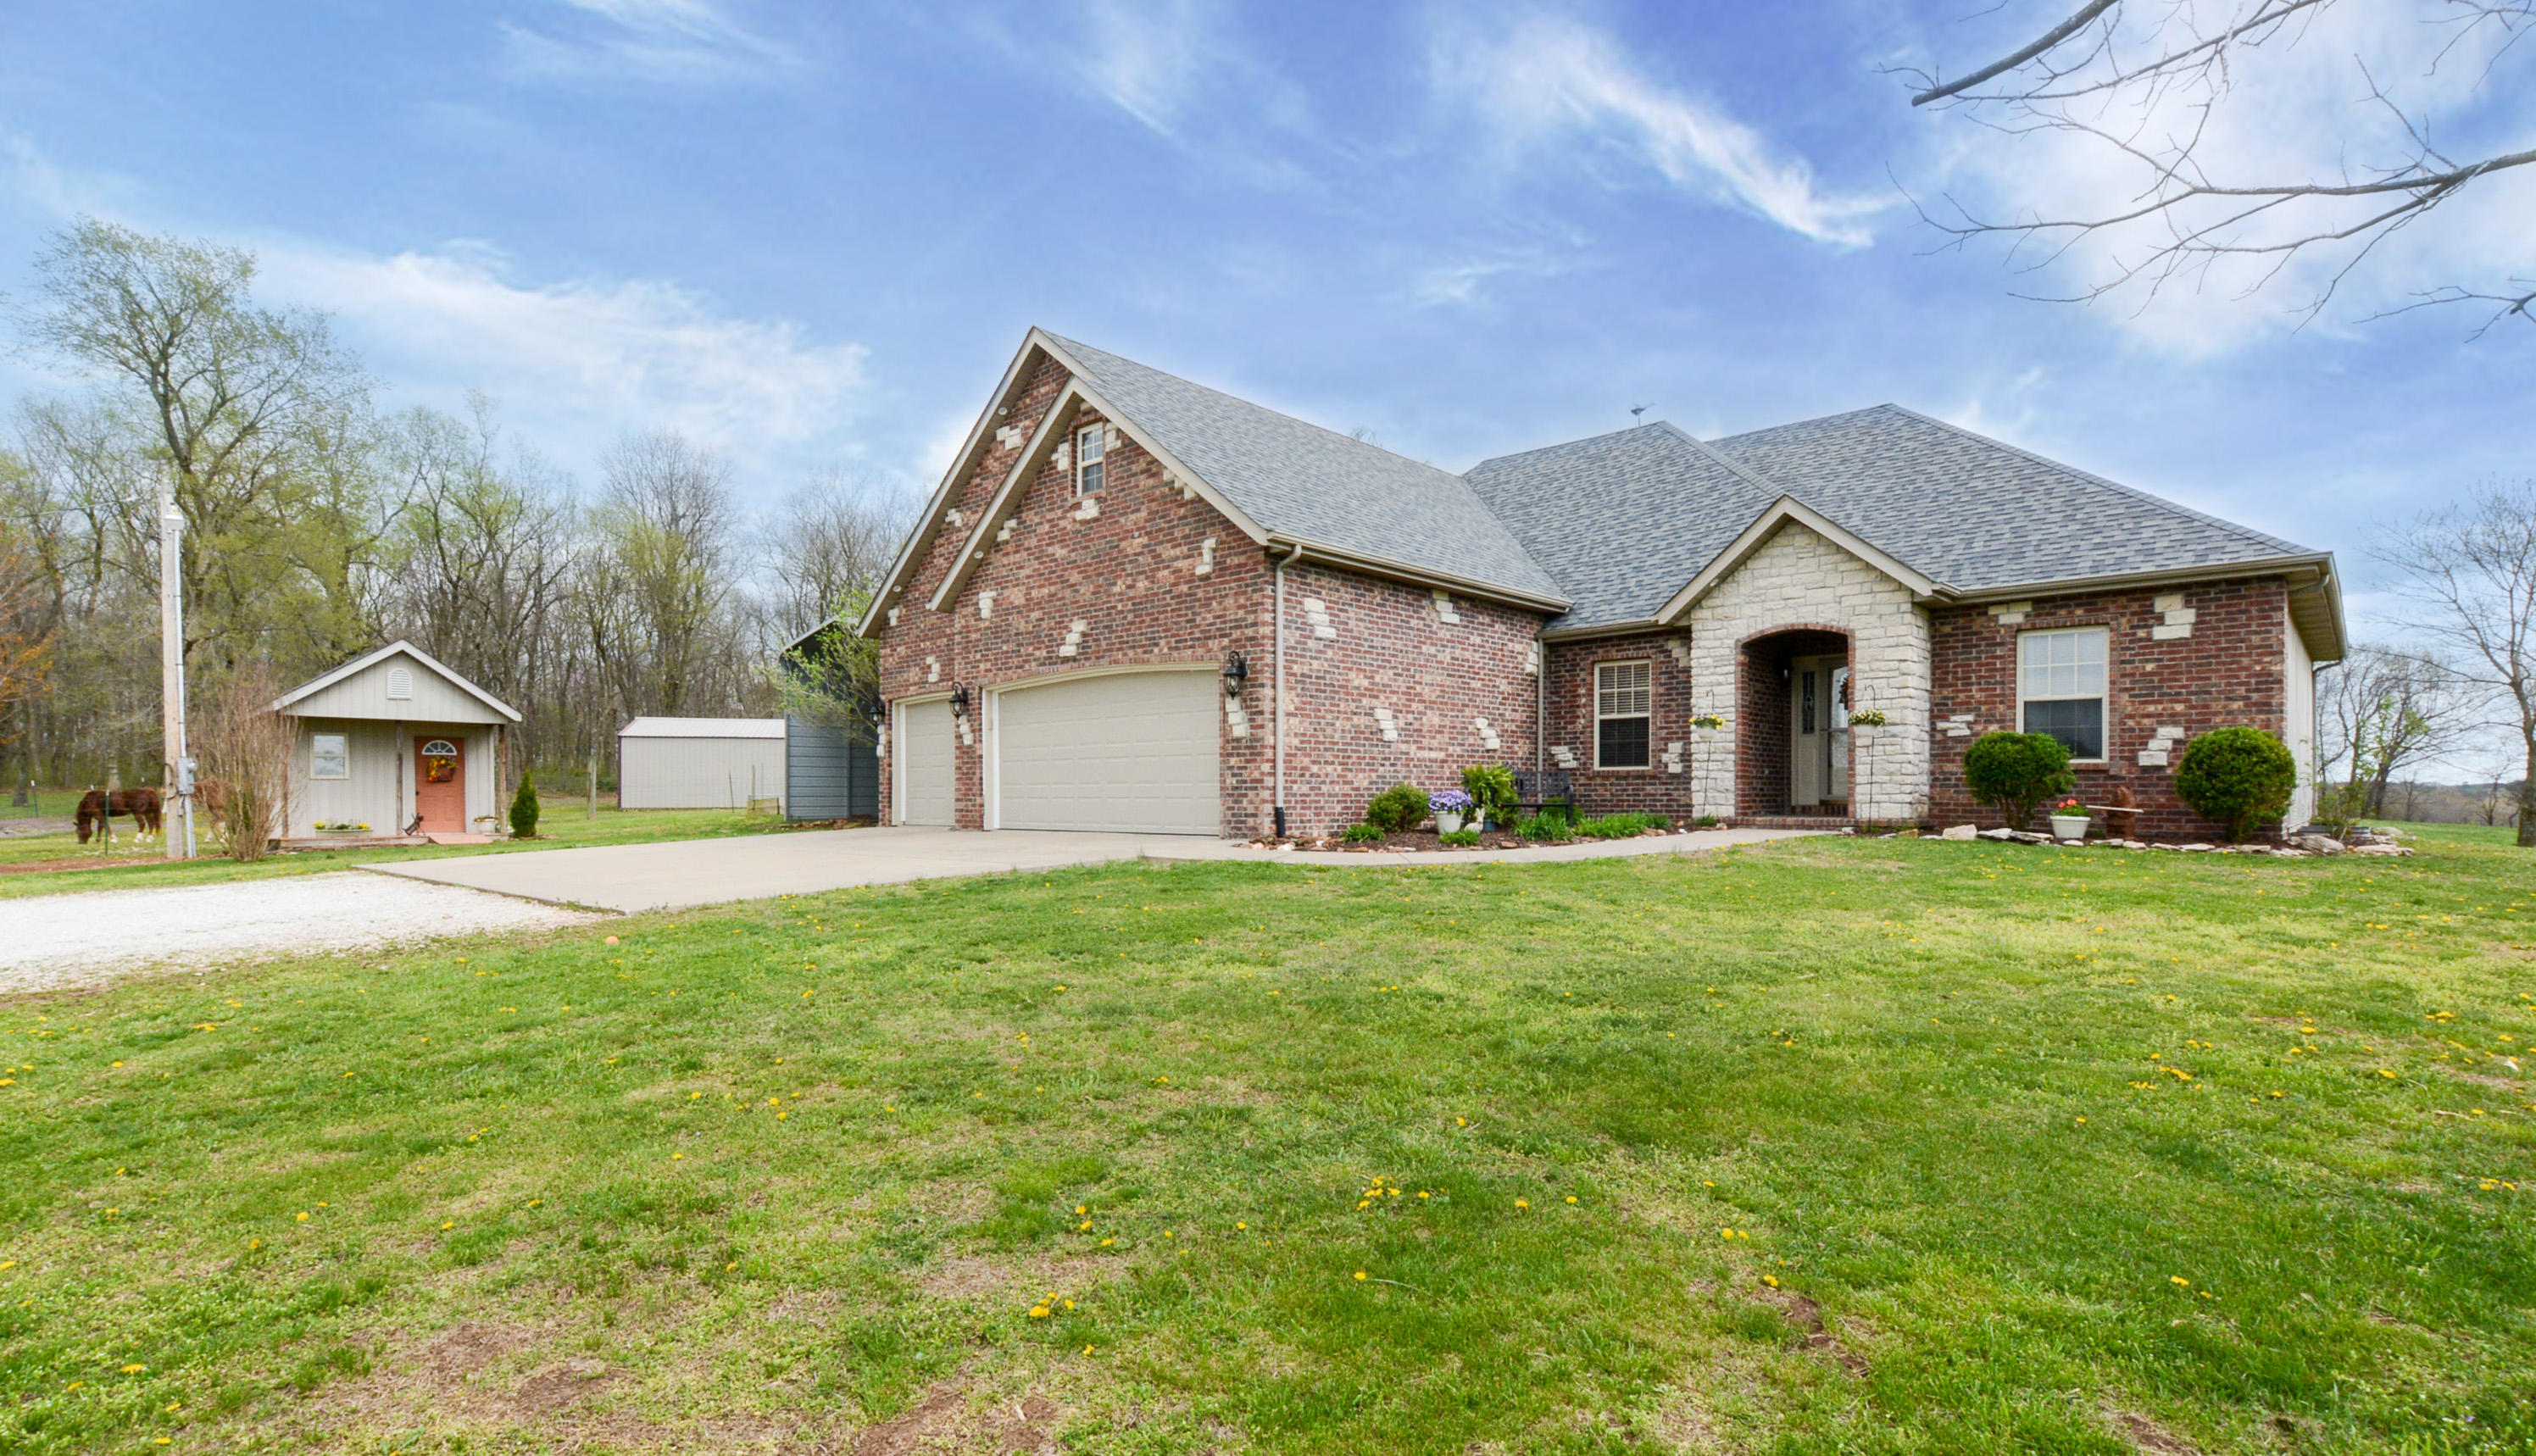 13638 West Wild Rose Lane Ash Grove, MO 65604